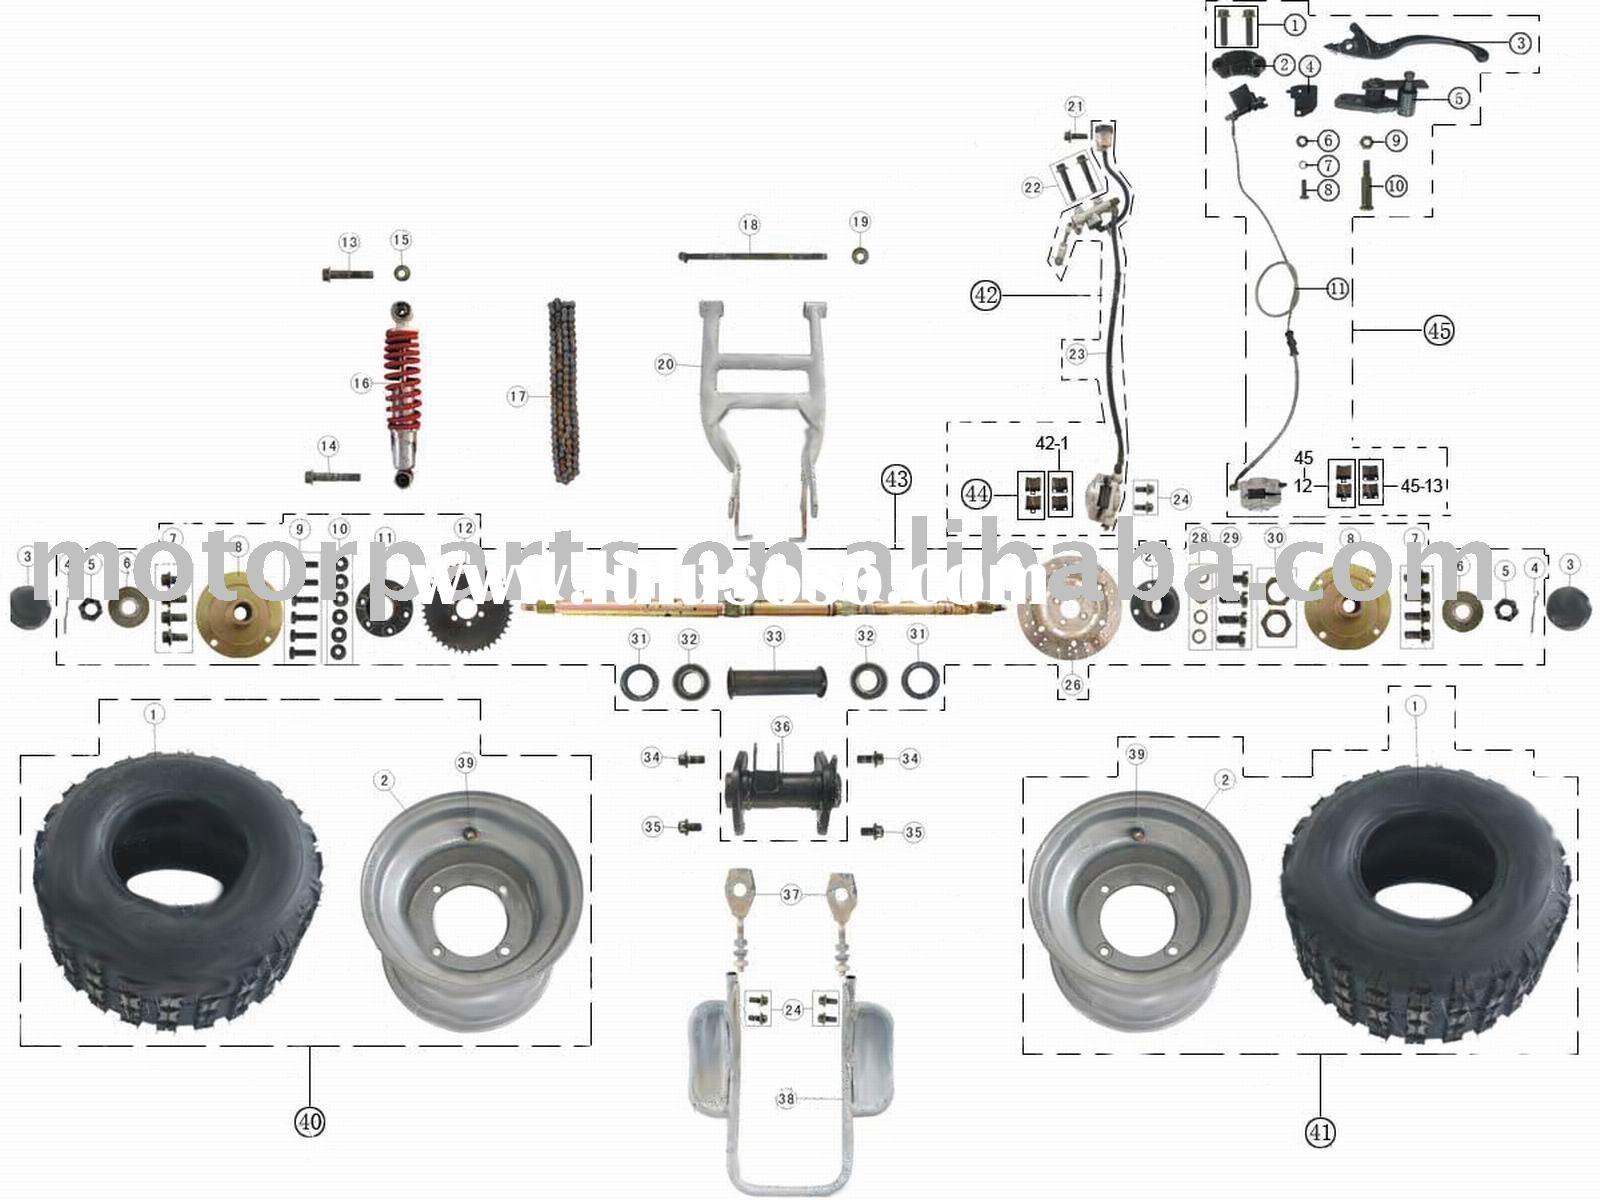 razor e150 wiring diagram citroen c5 towbar old fashioned e300 model the best